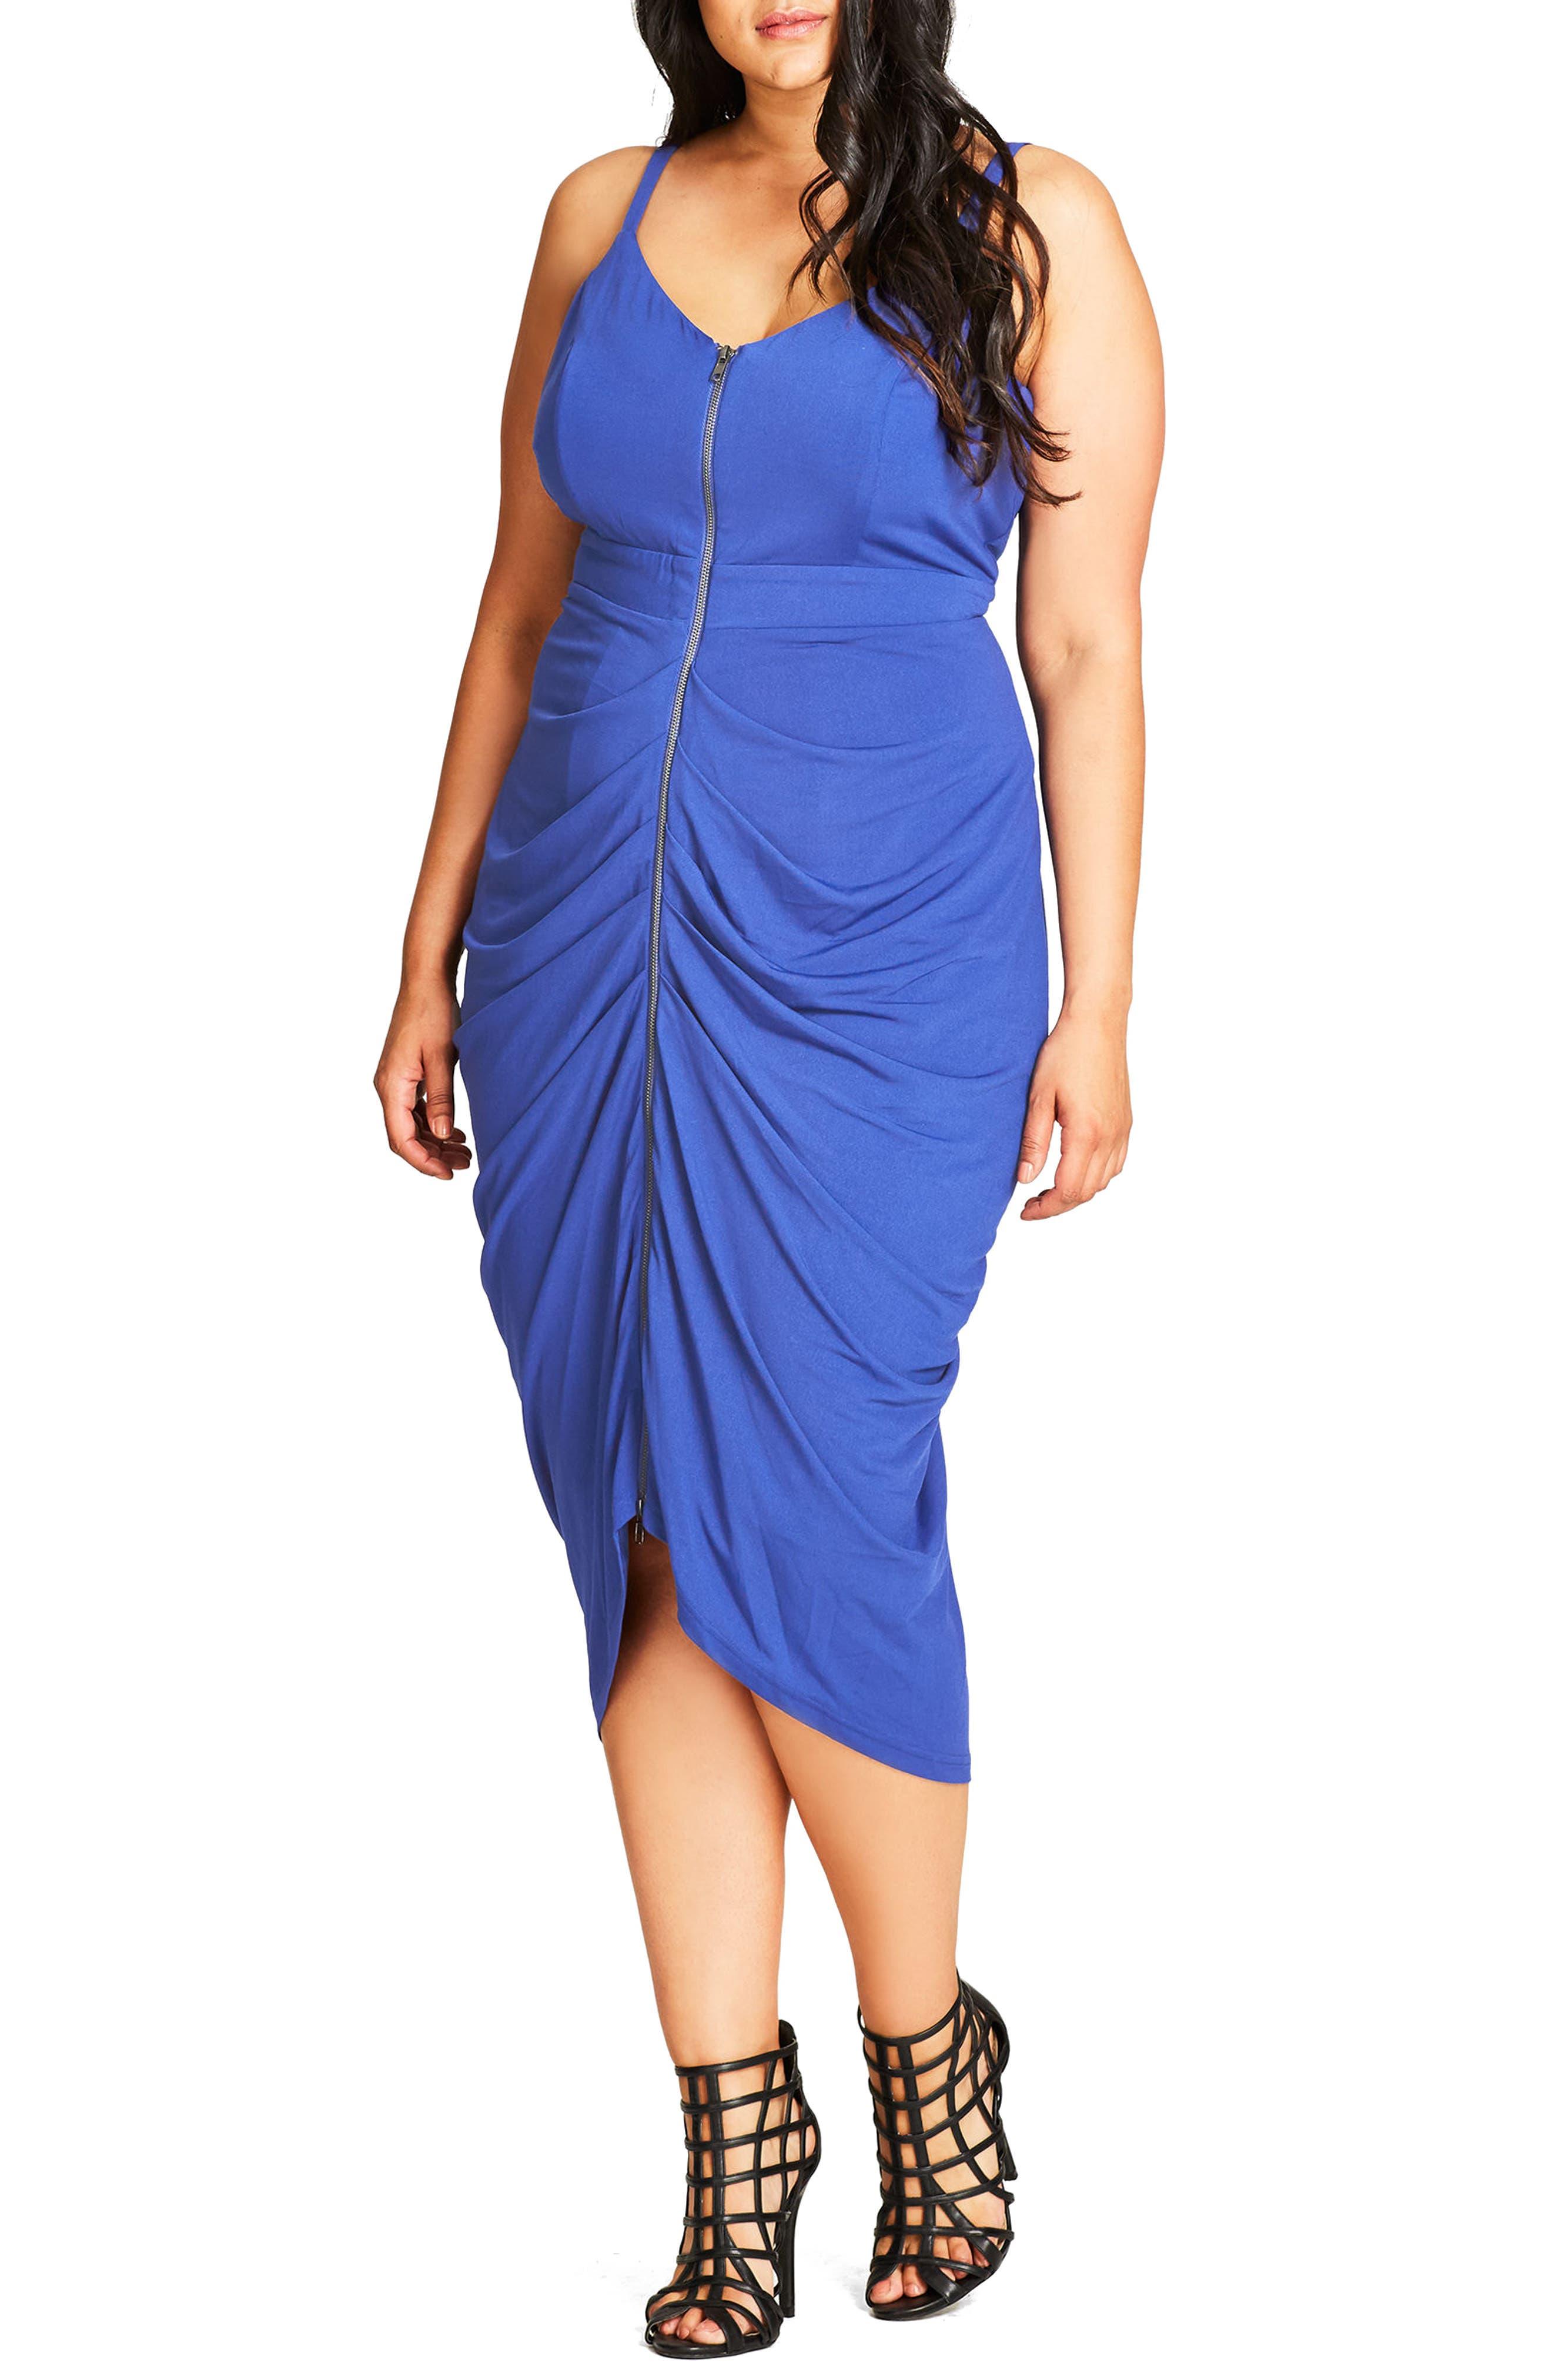 Main Image - City Chic Zip Front Body-Con Dress (Plus Size)